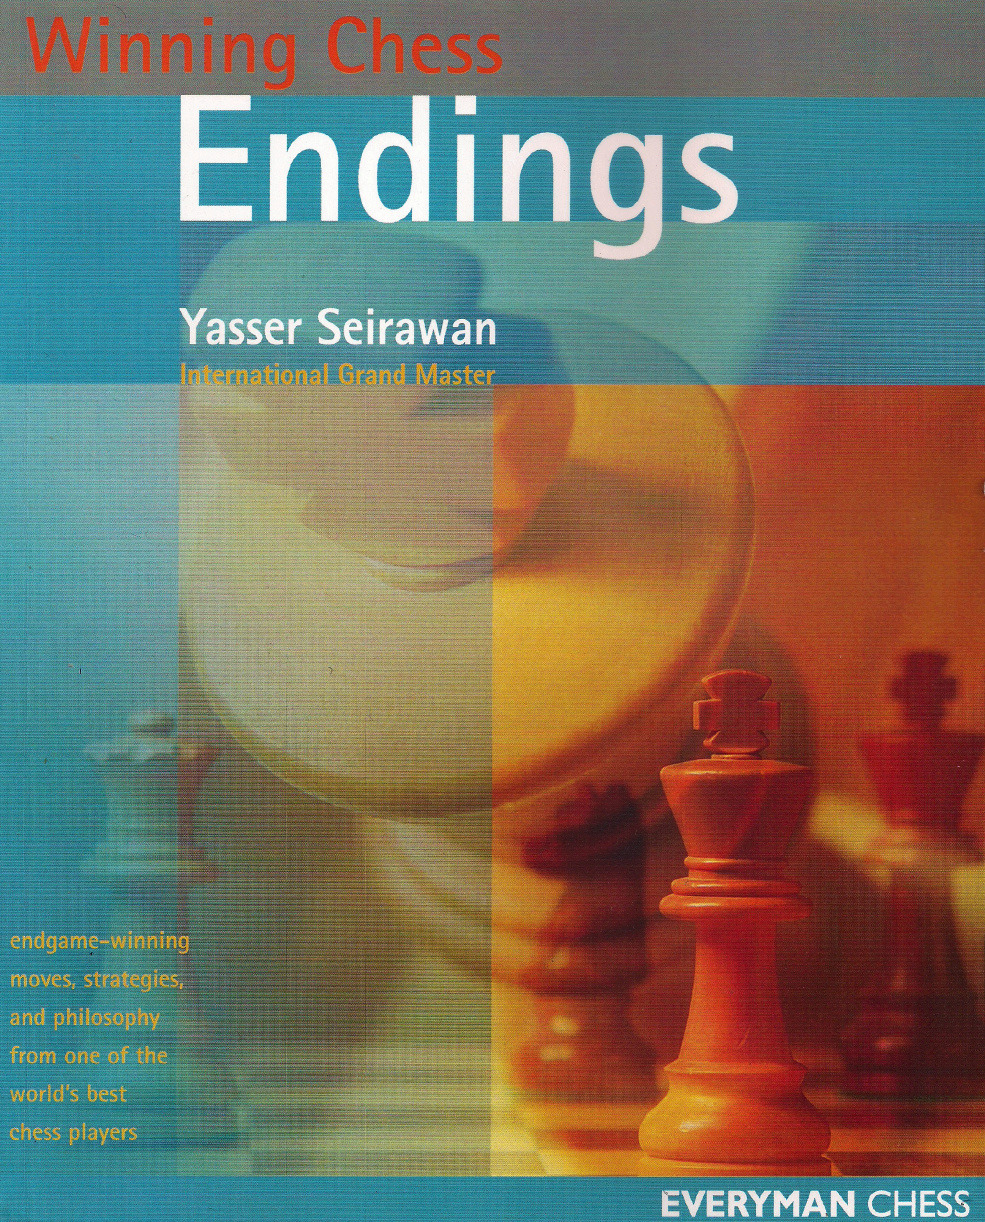 Yasser Seirawan_Winning Chess Endings (PDF+CBV) Wce10